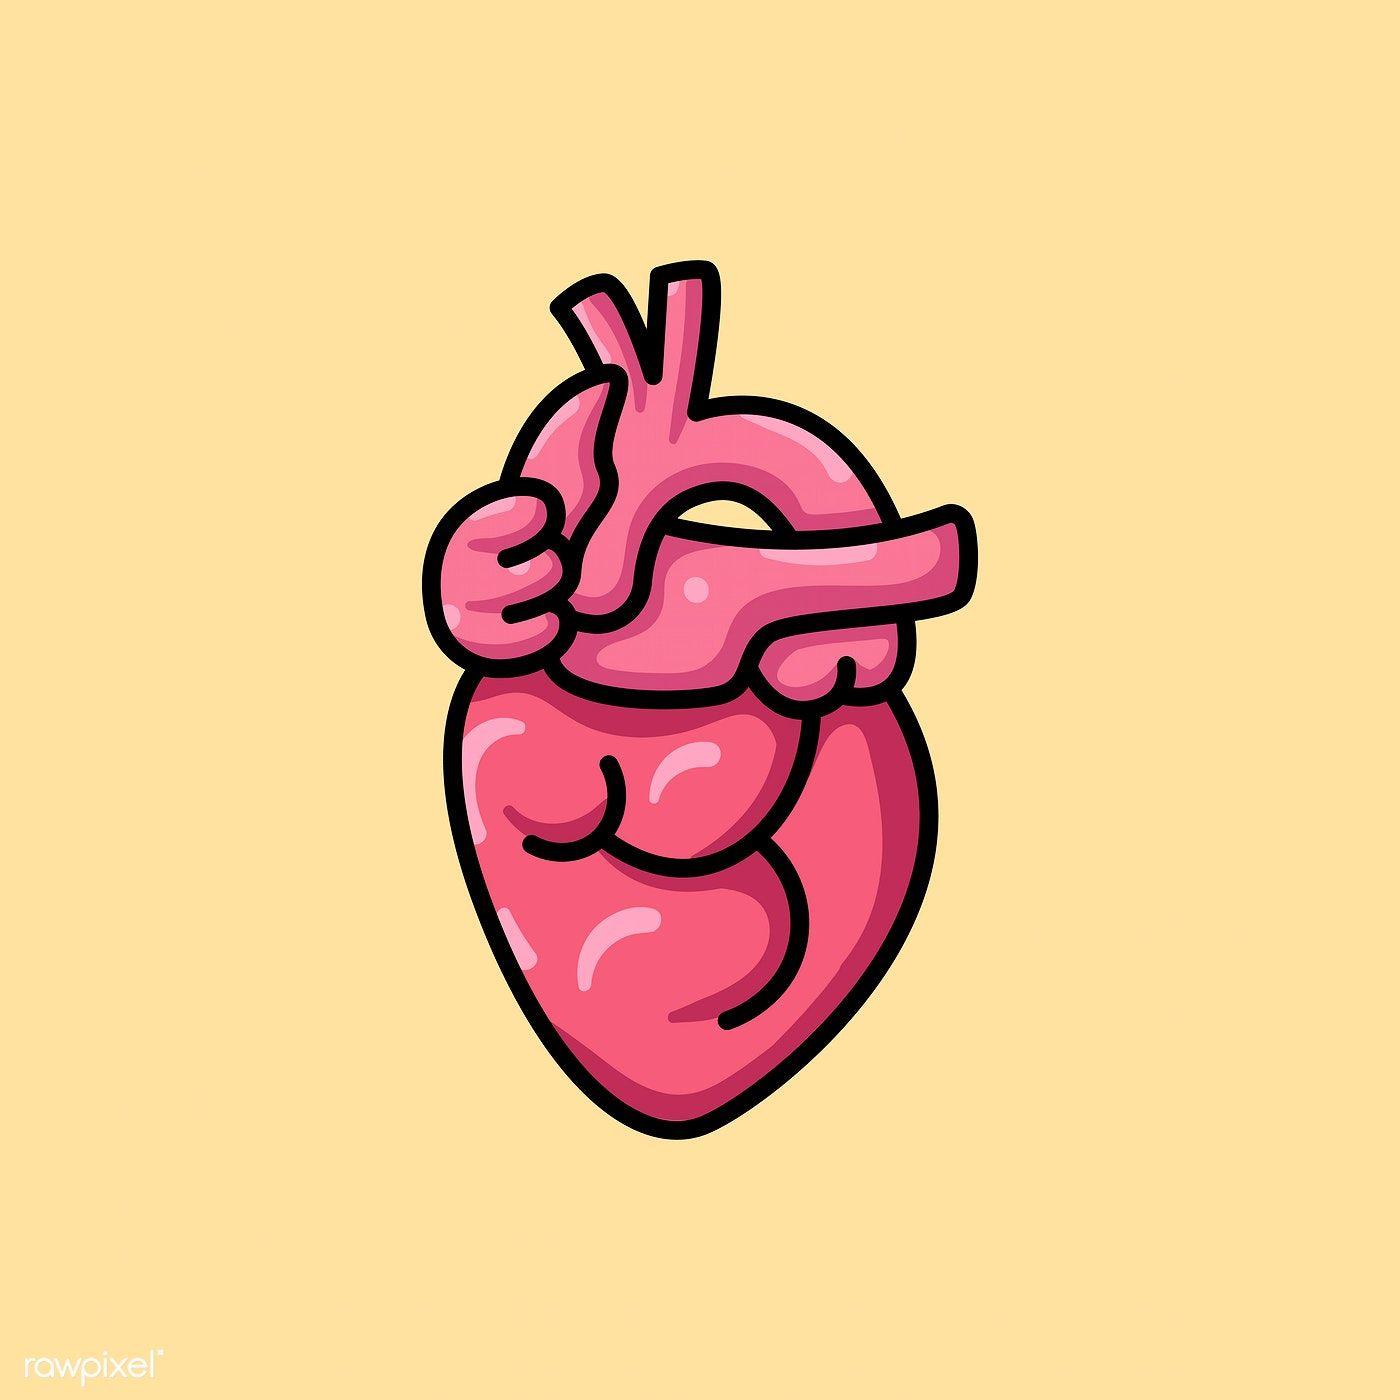 Pink Human Heart Icon Illustration Premium Image By Rawpixel Com Tvzsu Heart Icons Icon Illustration Human Heart